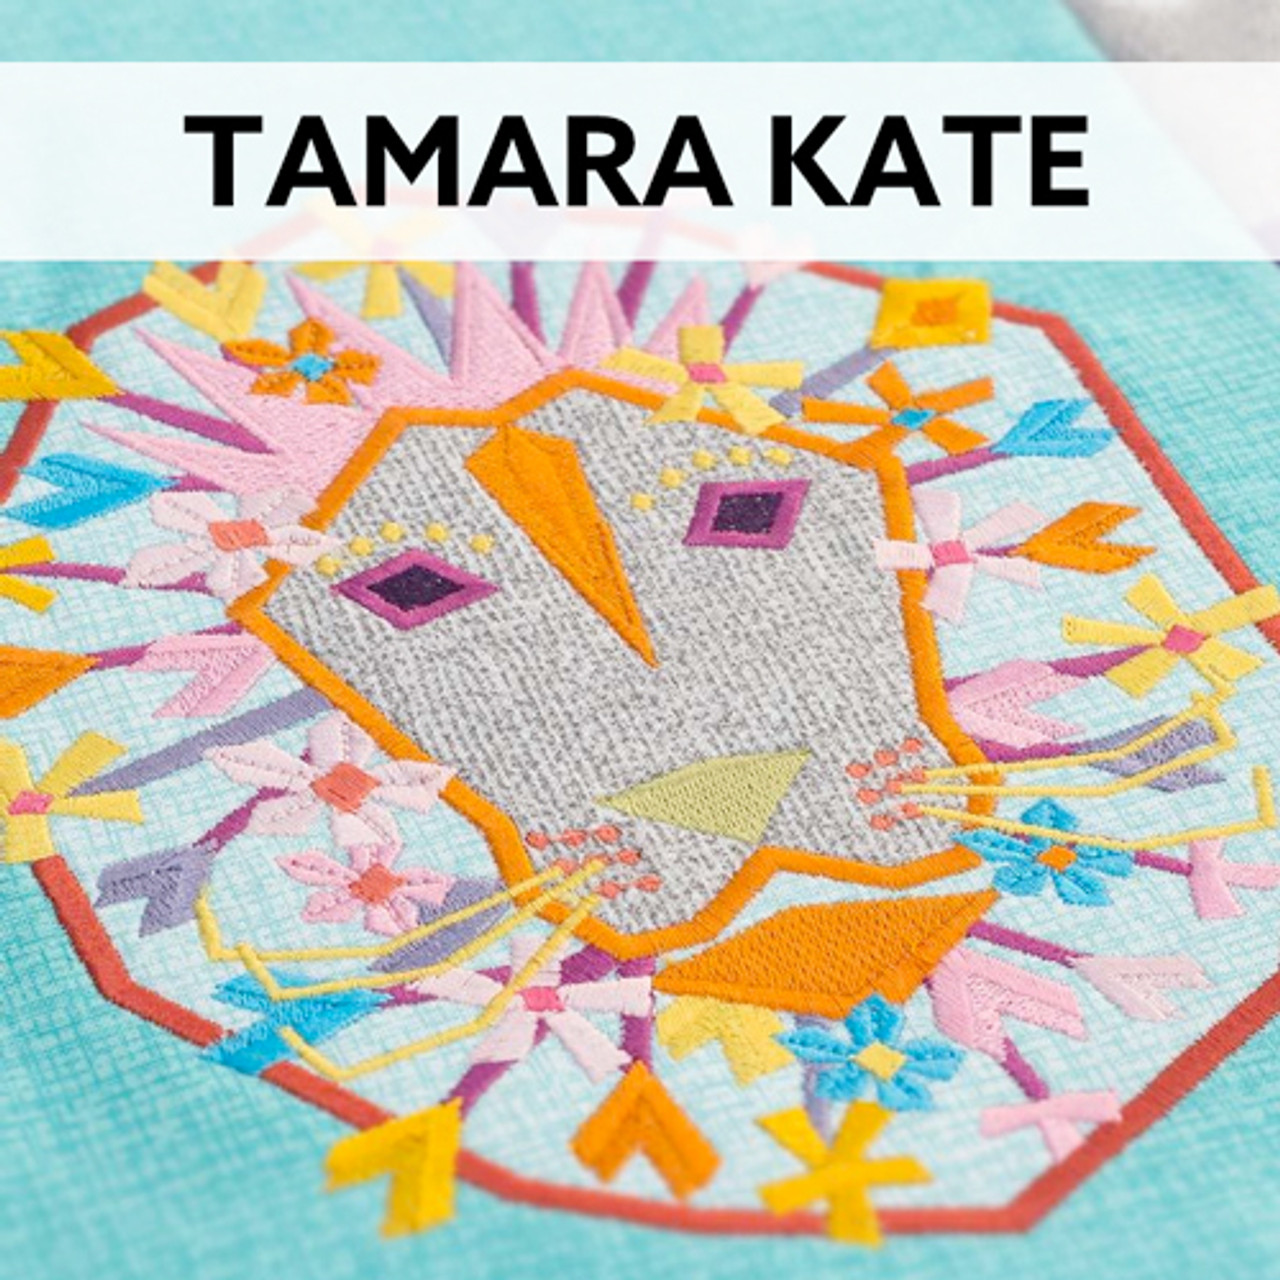 Tamara Kate